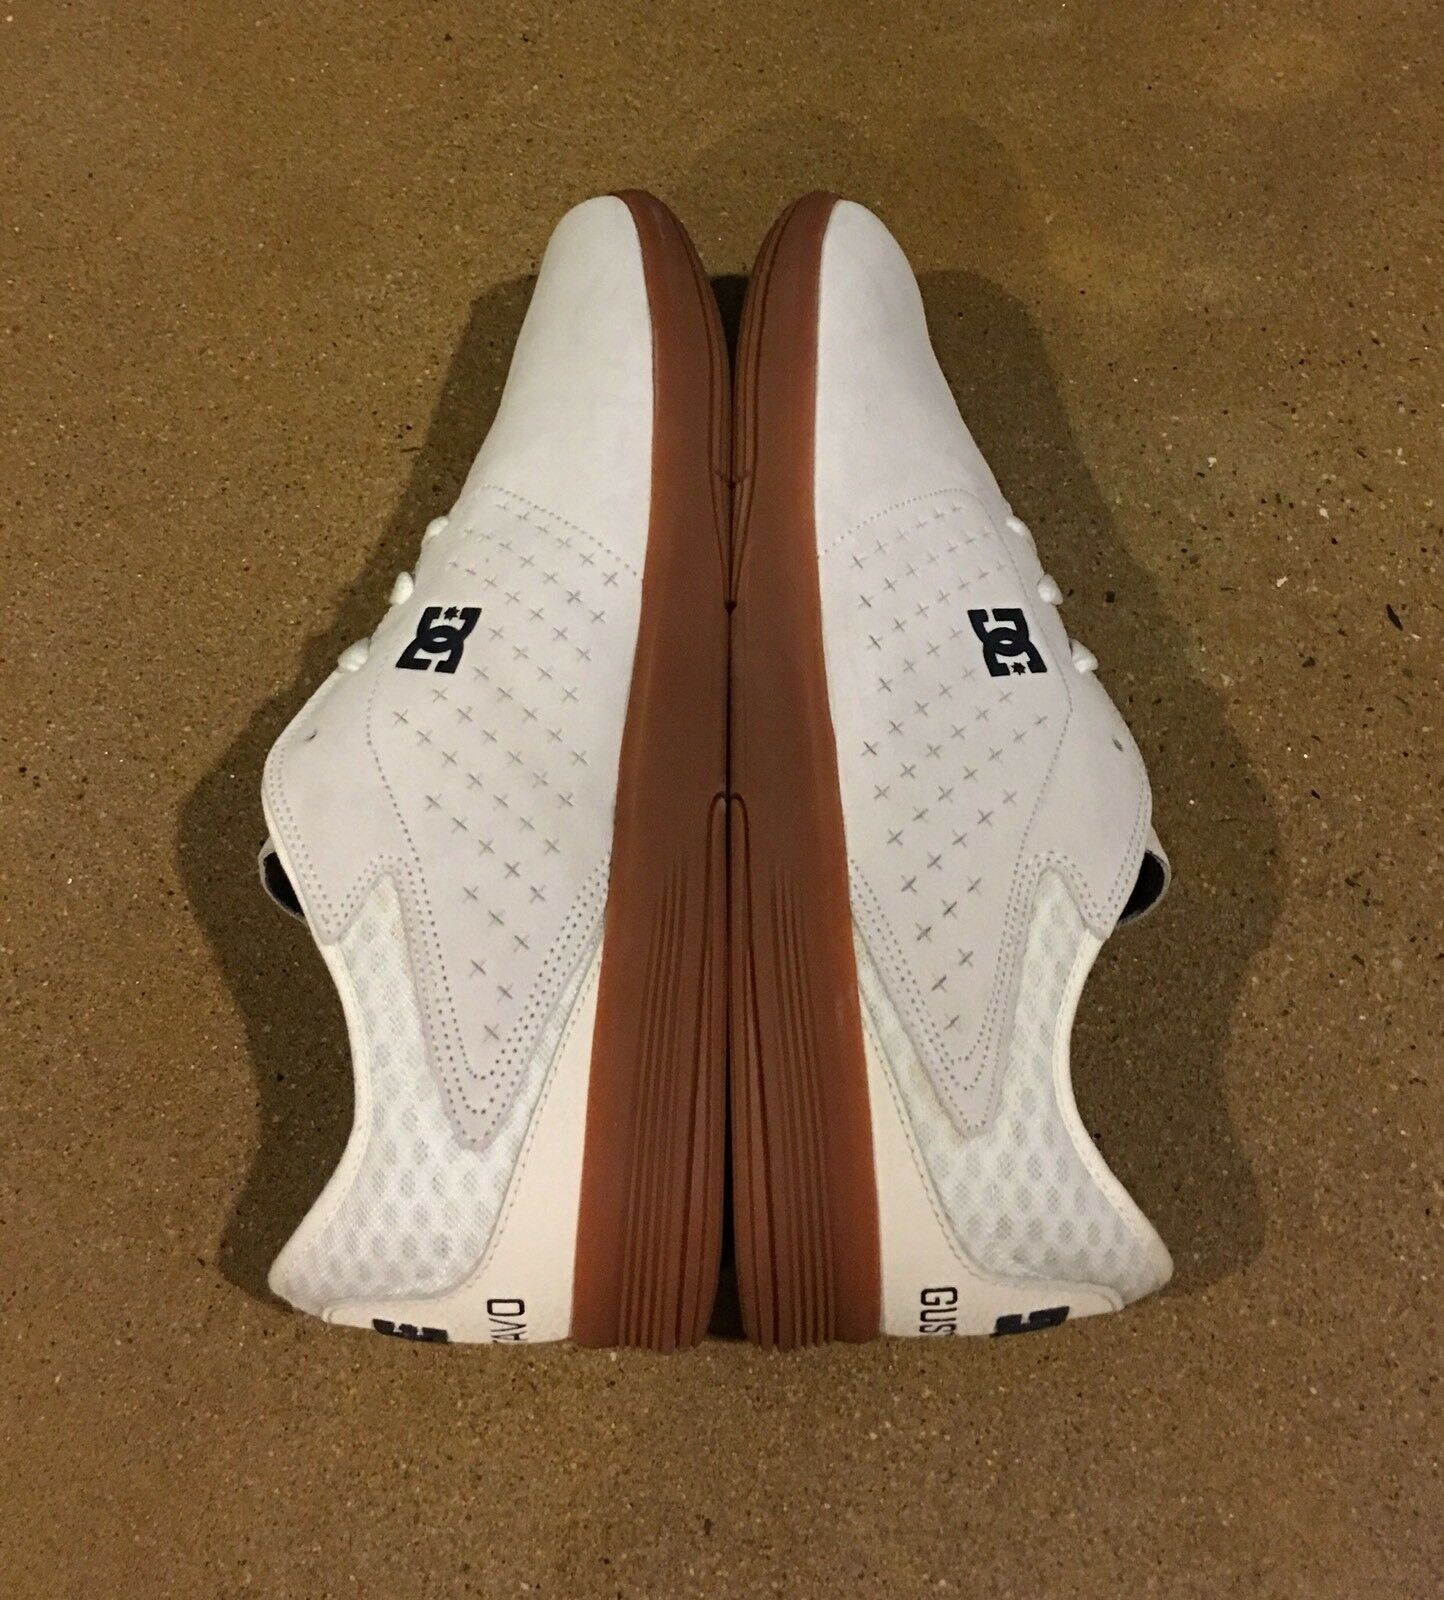 DC New Jack S Felipe Gustavo Men's Size 14 US BMX Skate Shoes Sneakers Deadstock